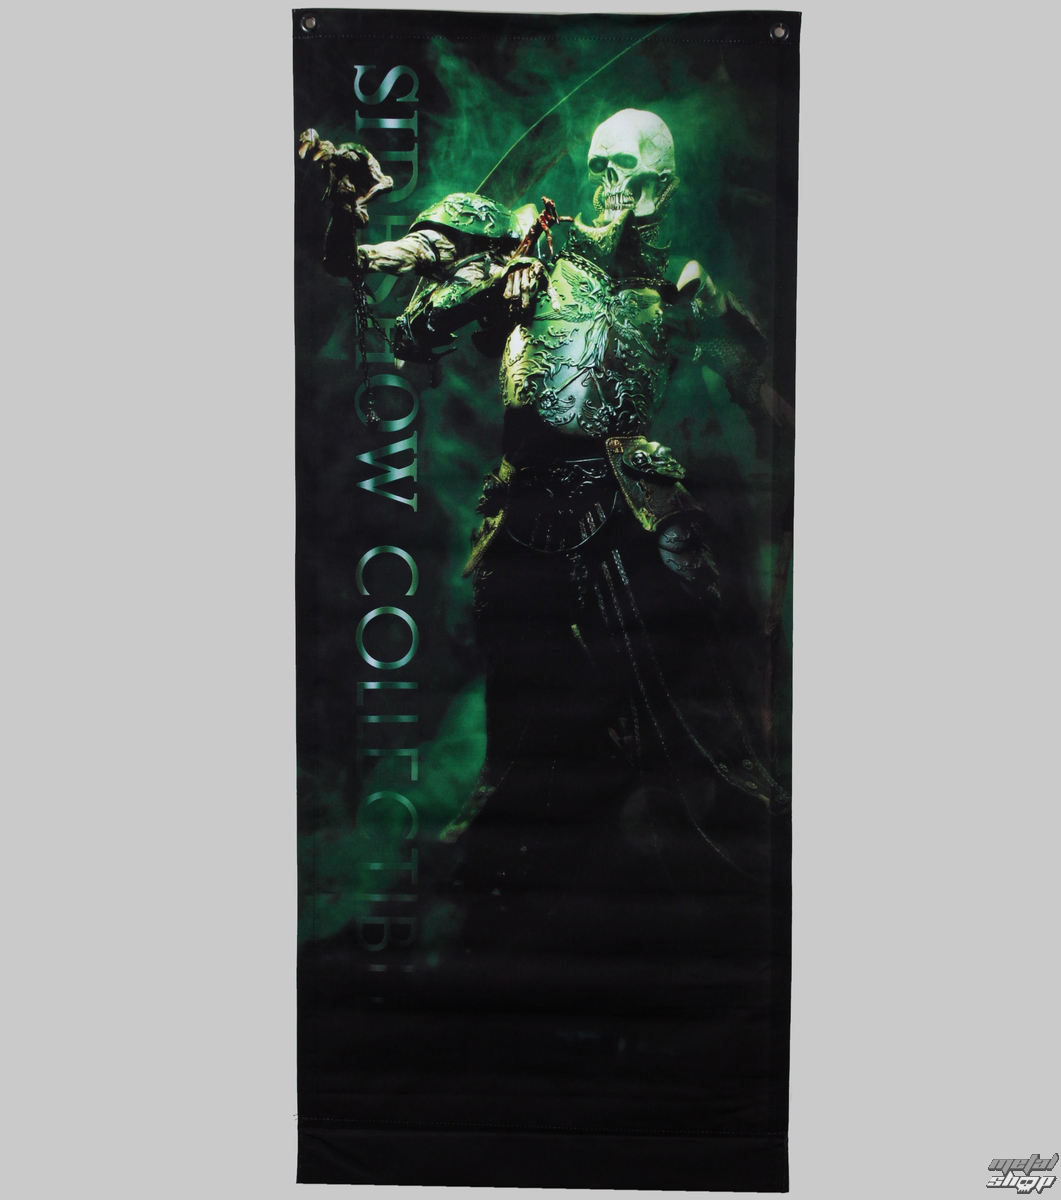 vlajka (baner) The Reaper - 51x122 - SSBAN005S